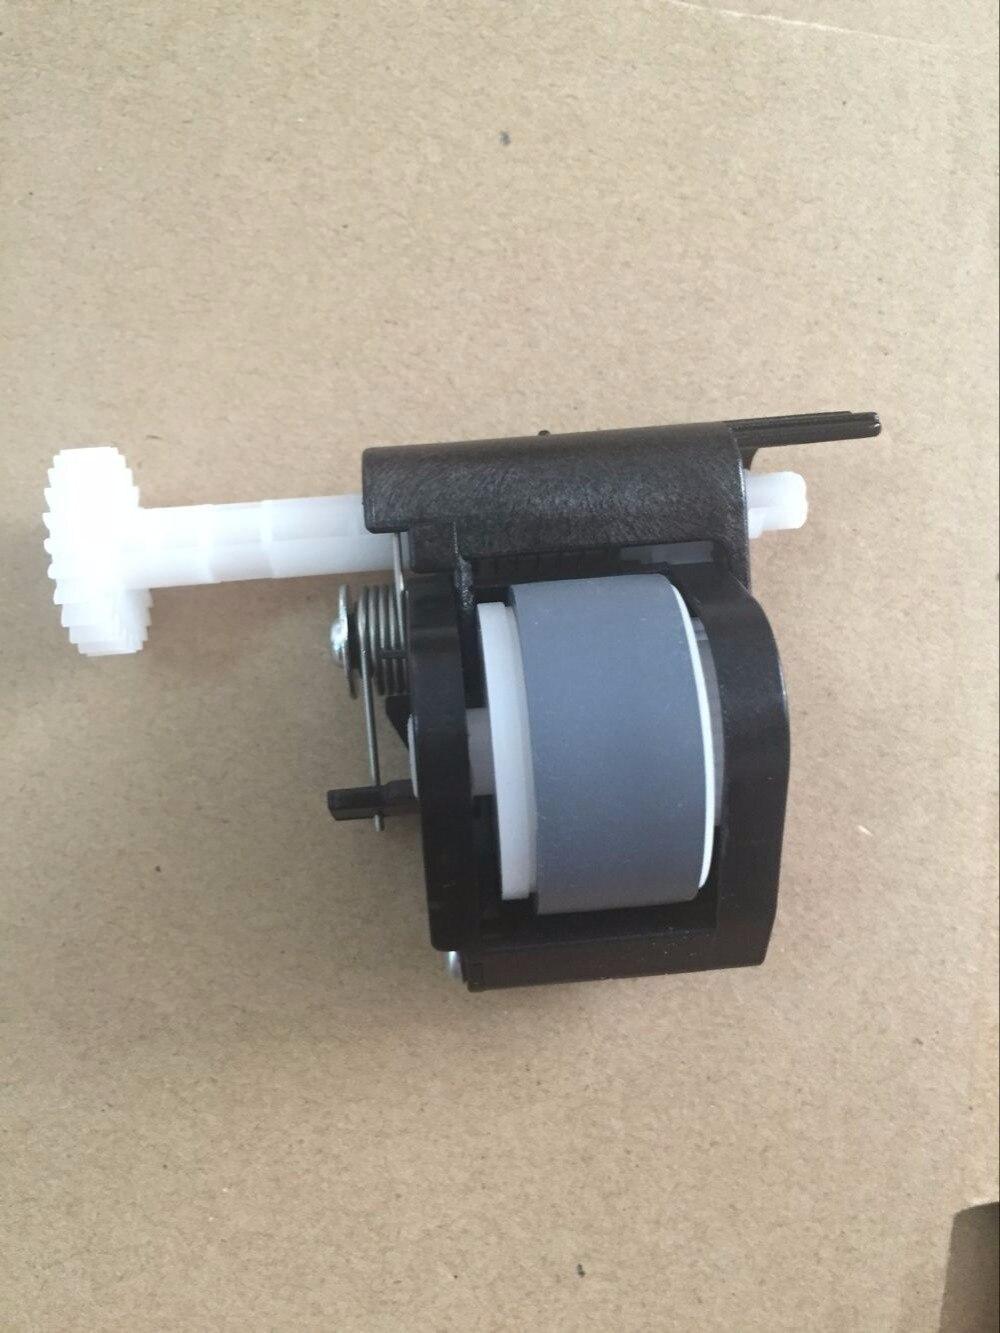 NEW Pickup Roller for Epson L200 L201 L100 L101 T22 ME33 ME330 ME35 ME350 TX120 TX130 SX125 S22 SX130 PICKUP ASSY